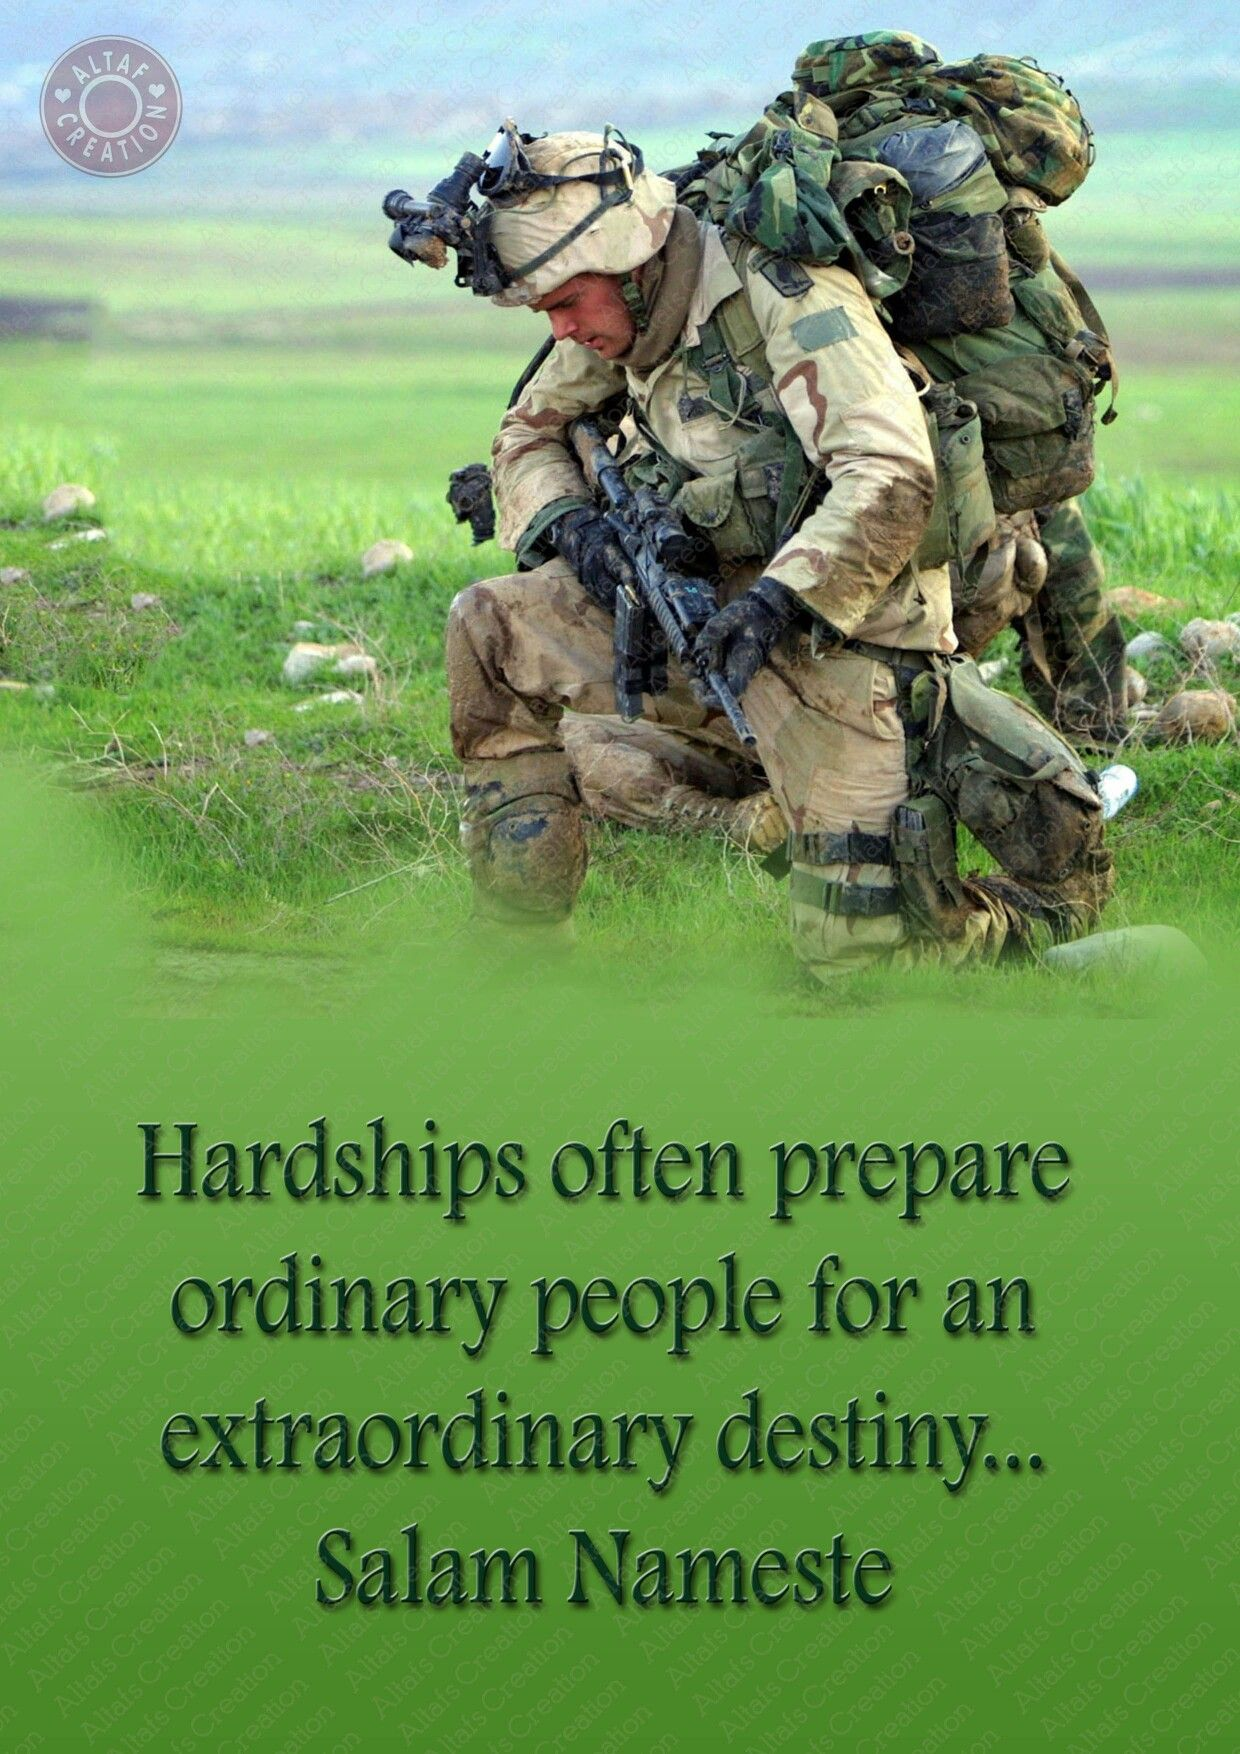 Good Morning Military Quotes   Quotes fantasyquote.com